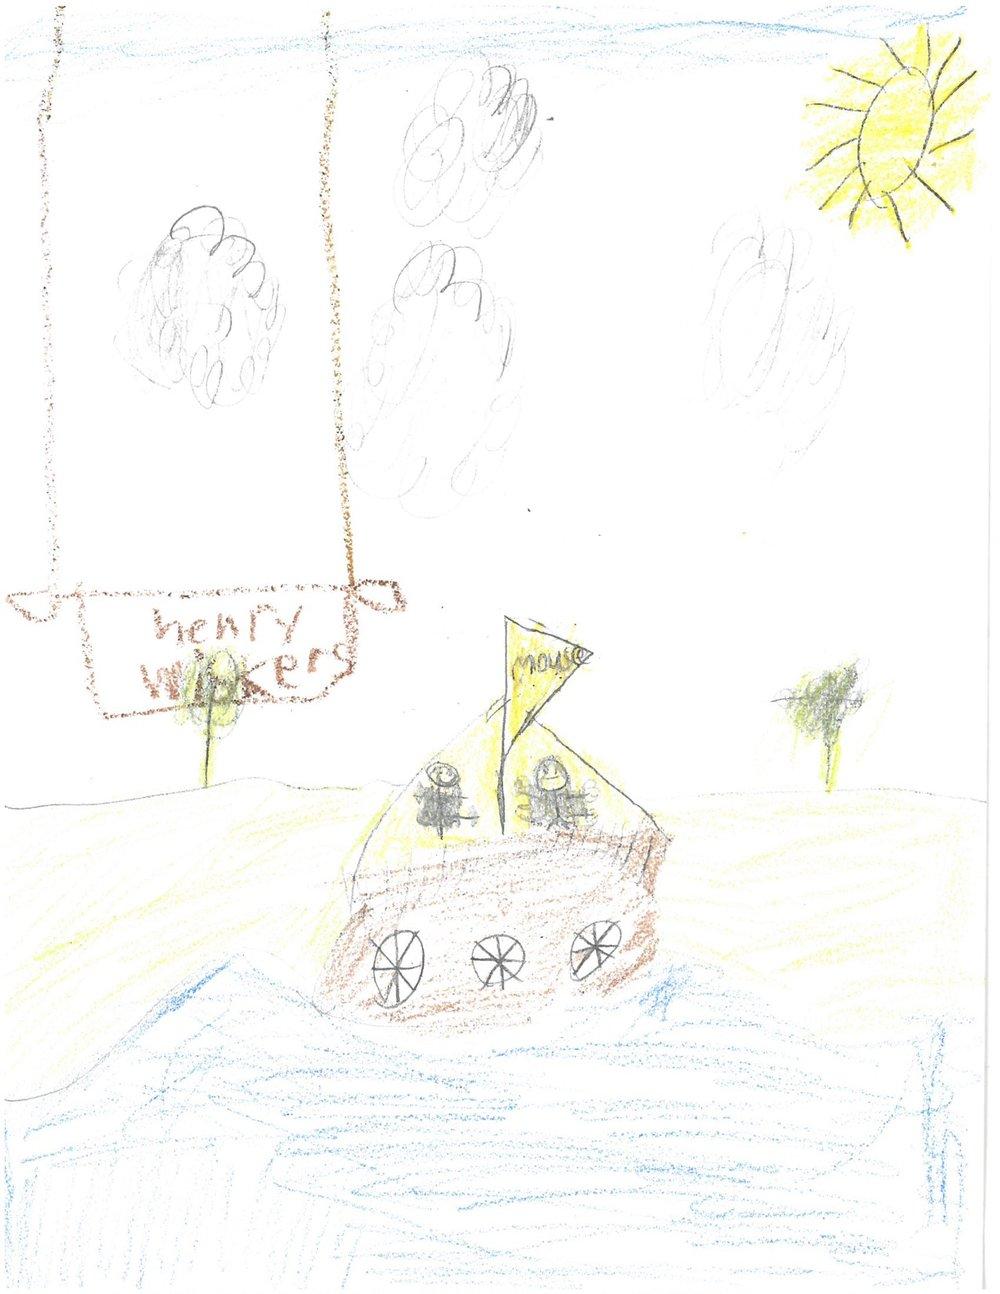 By Mac, 2nd Grade